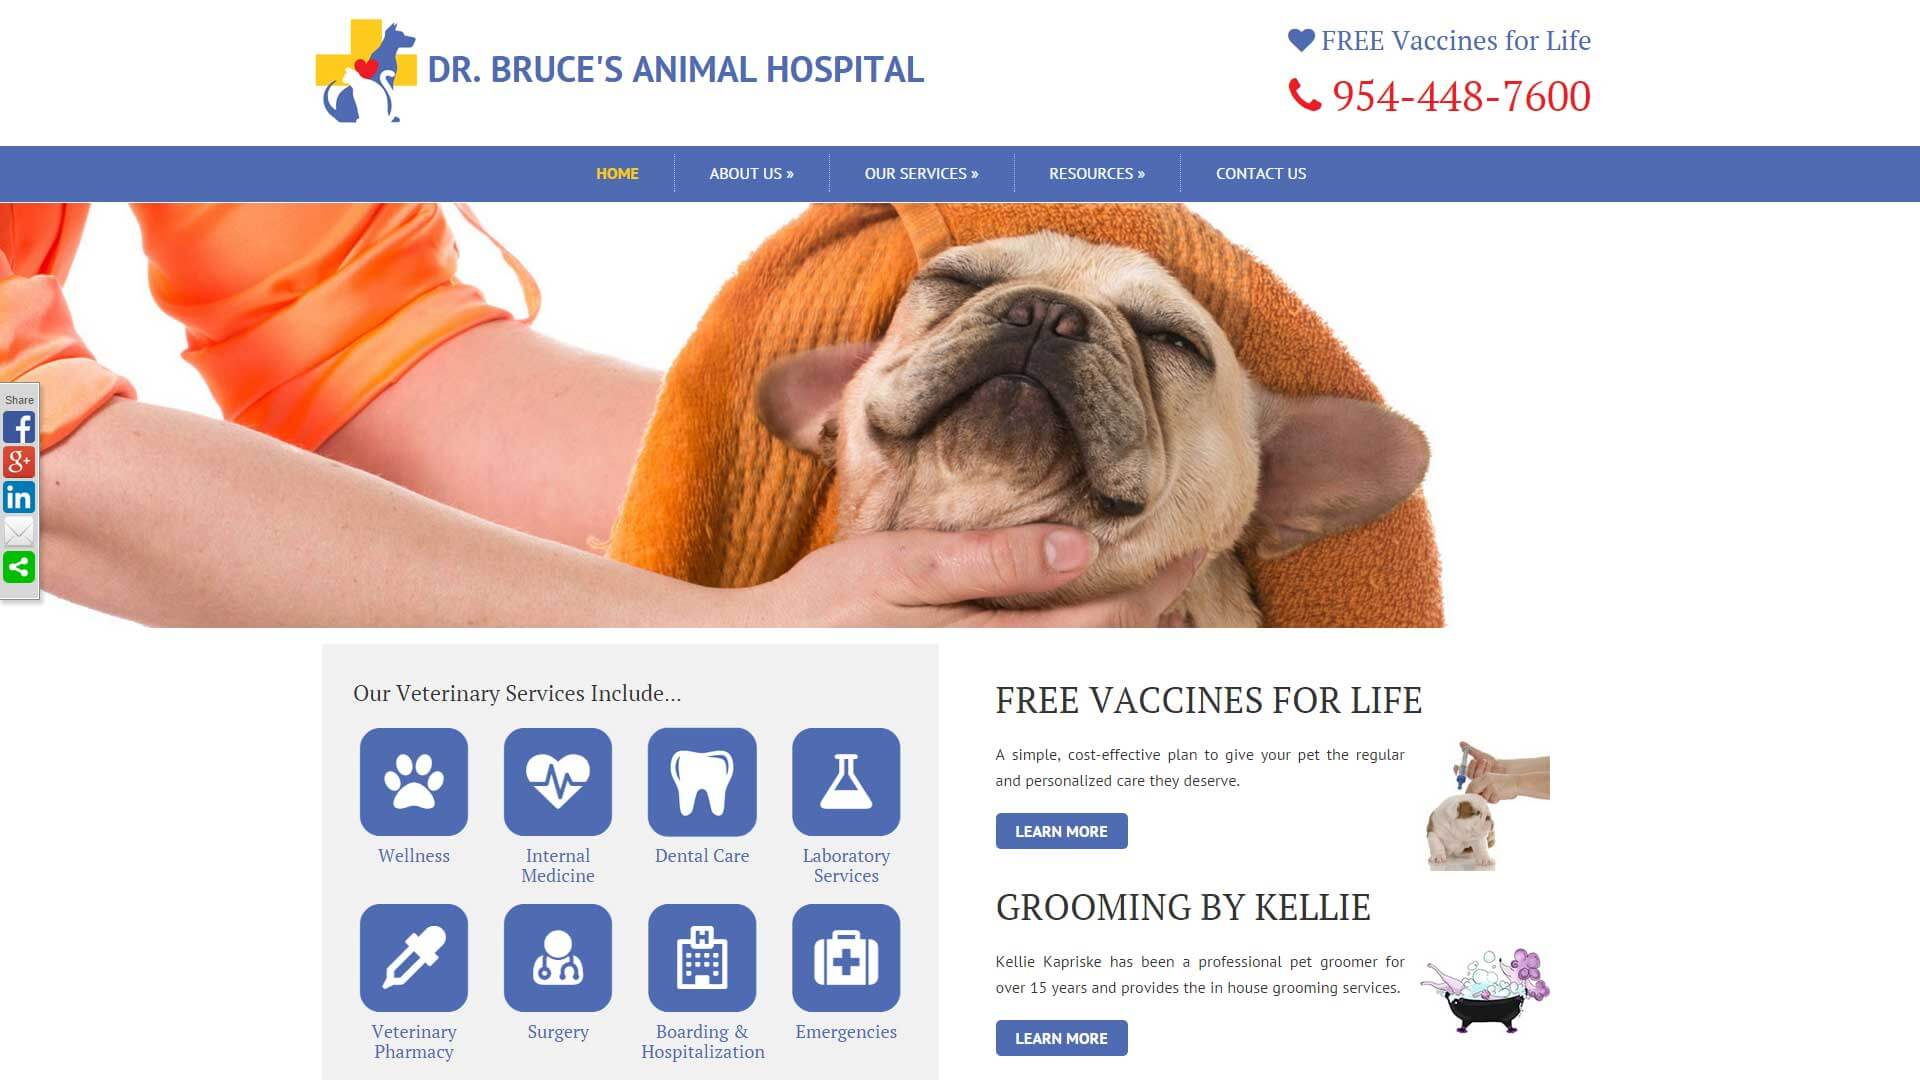 Dr. Bruce's Animal Hospital